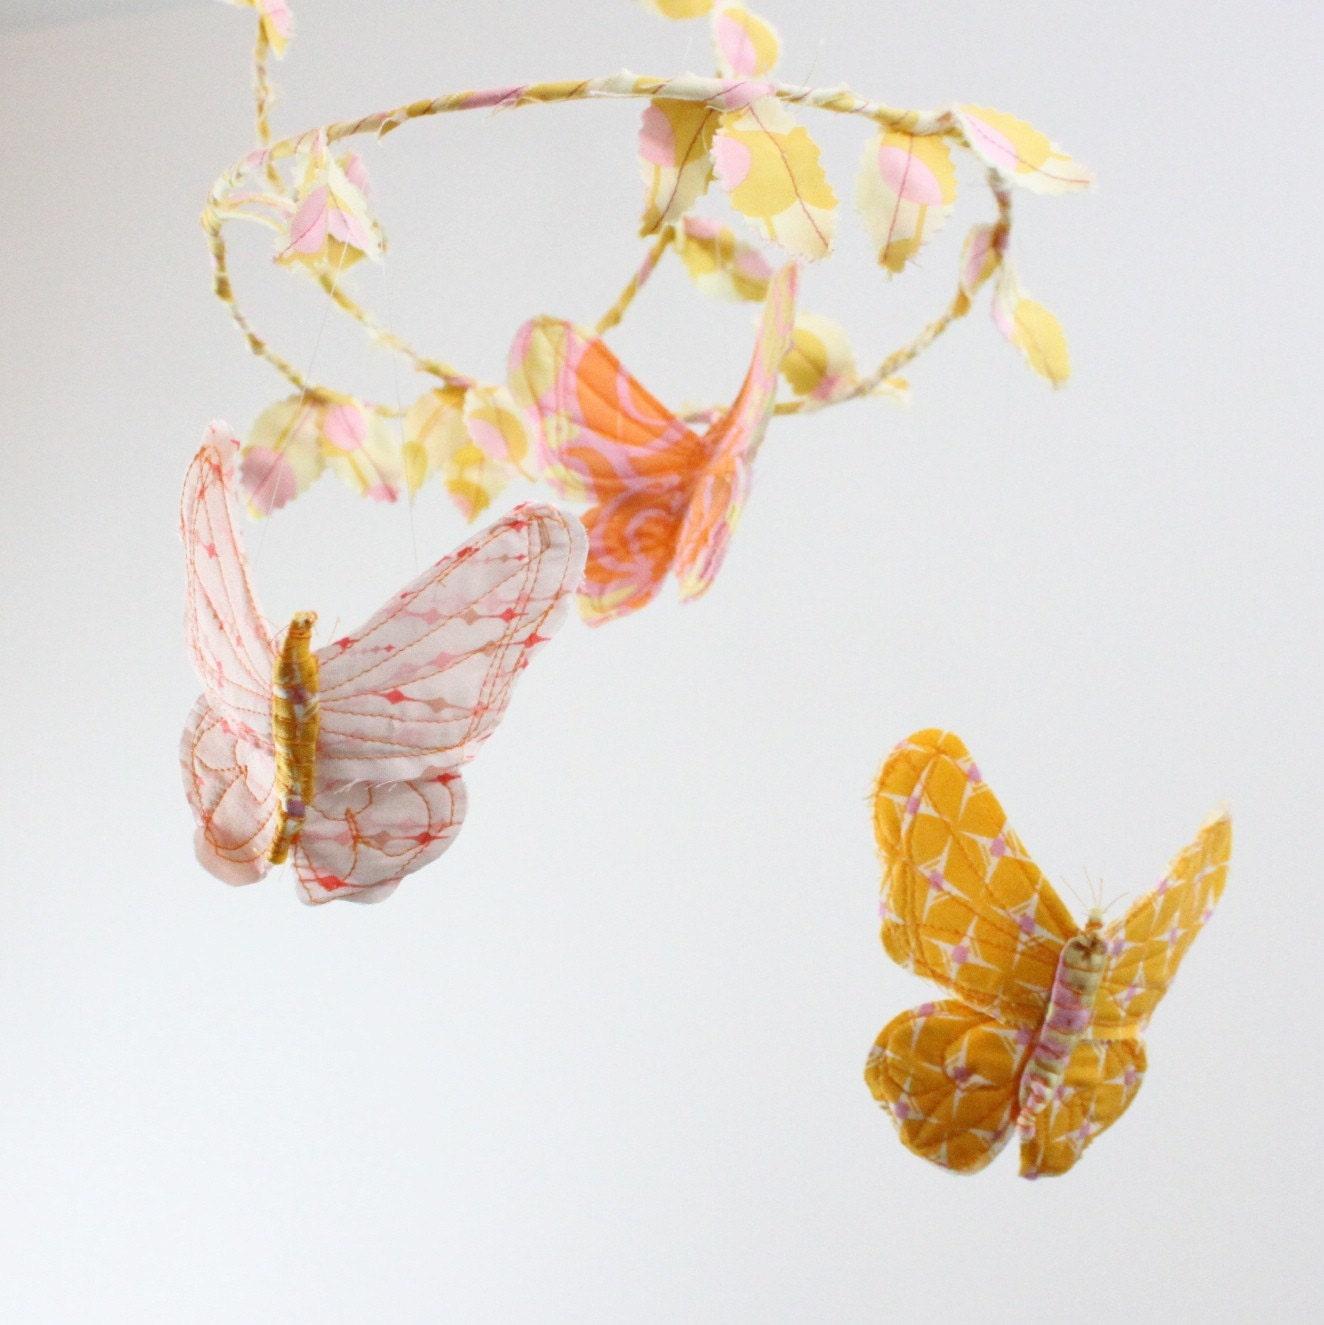 CUSTOM Butterfly Mobile - handmade fabric mobile for Nursery Decor